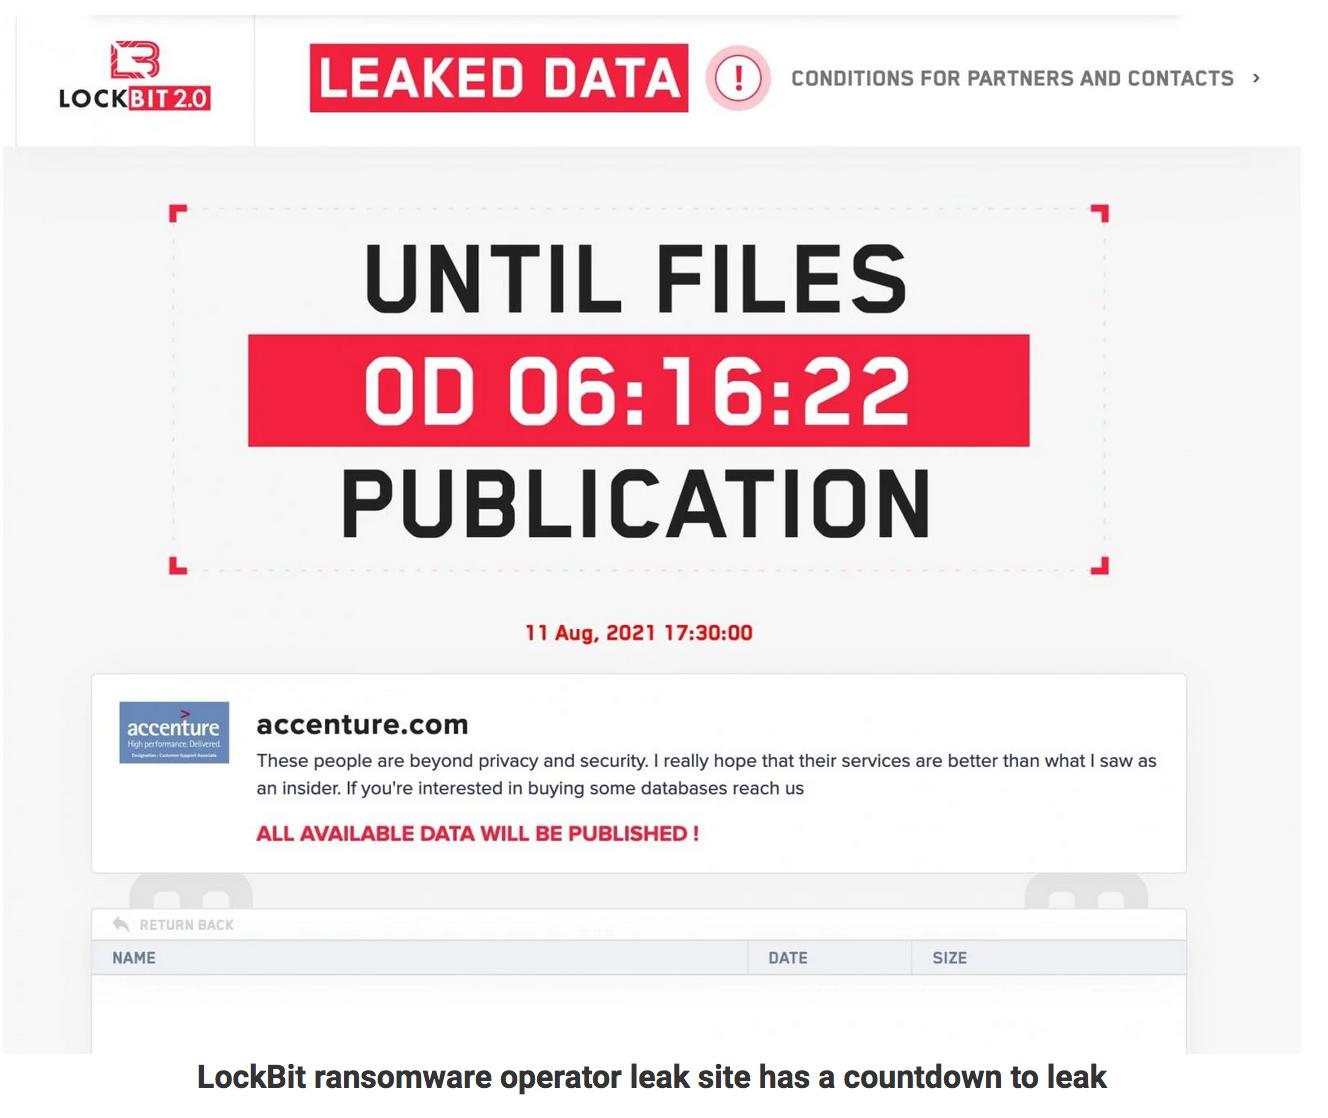 Accenture Confirms Hack After LockBit Ransomware Data Leak Threats